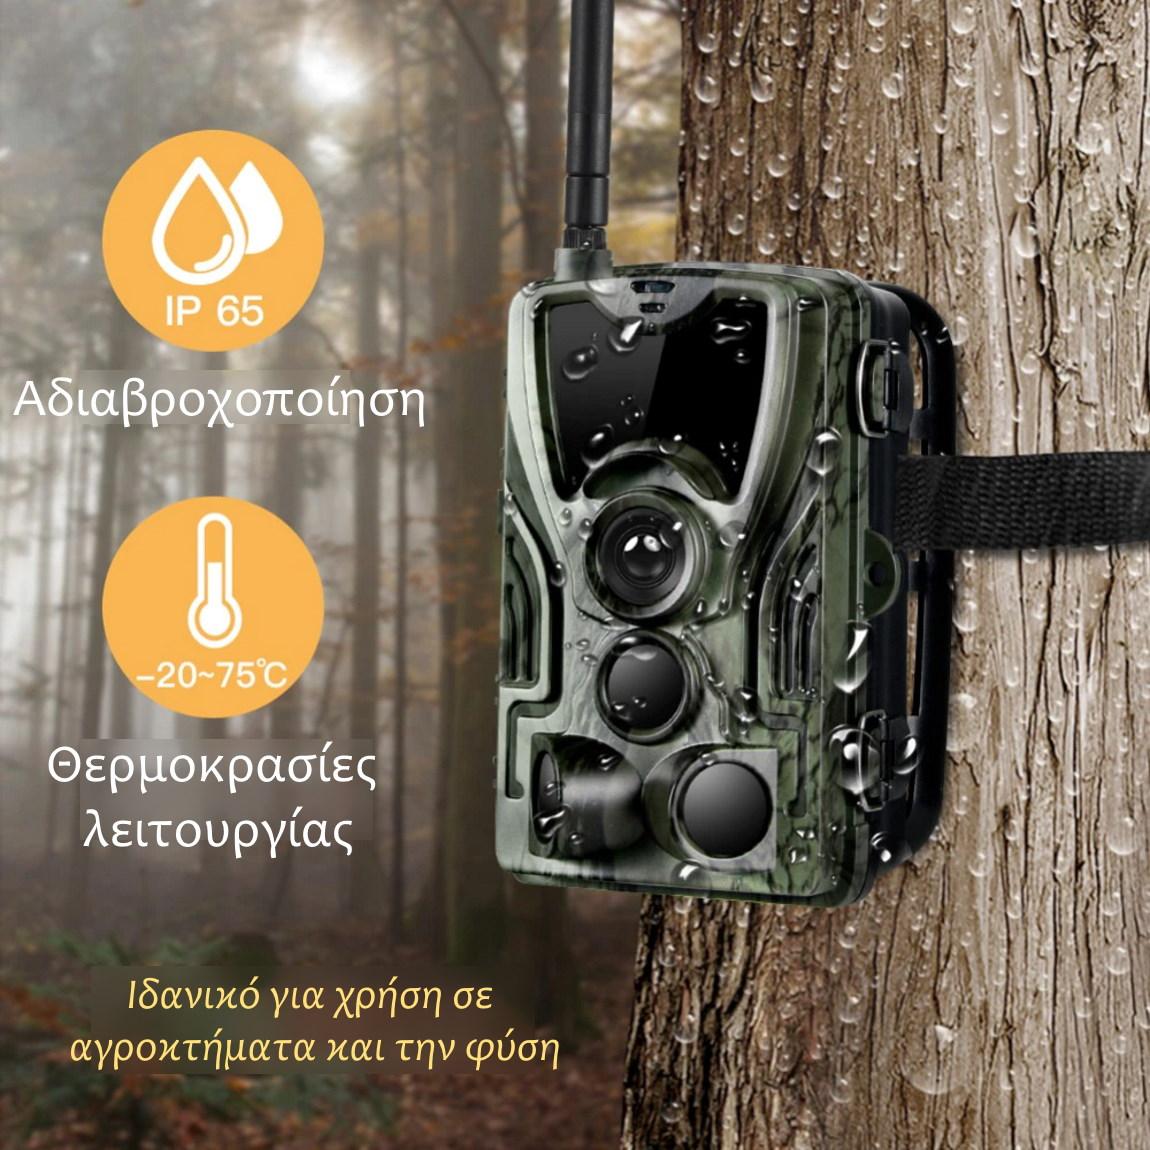 Suntek 801Plus κάμερα με αδιαβροχοποίηση IP65